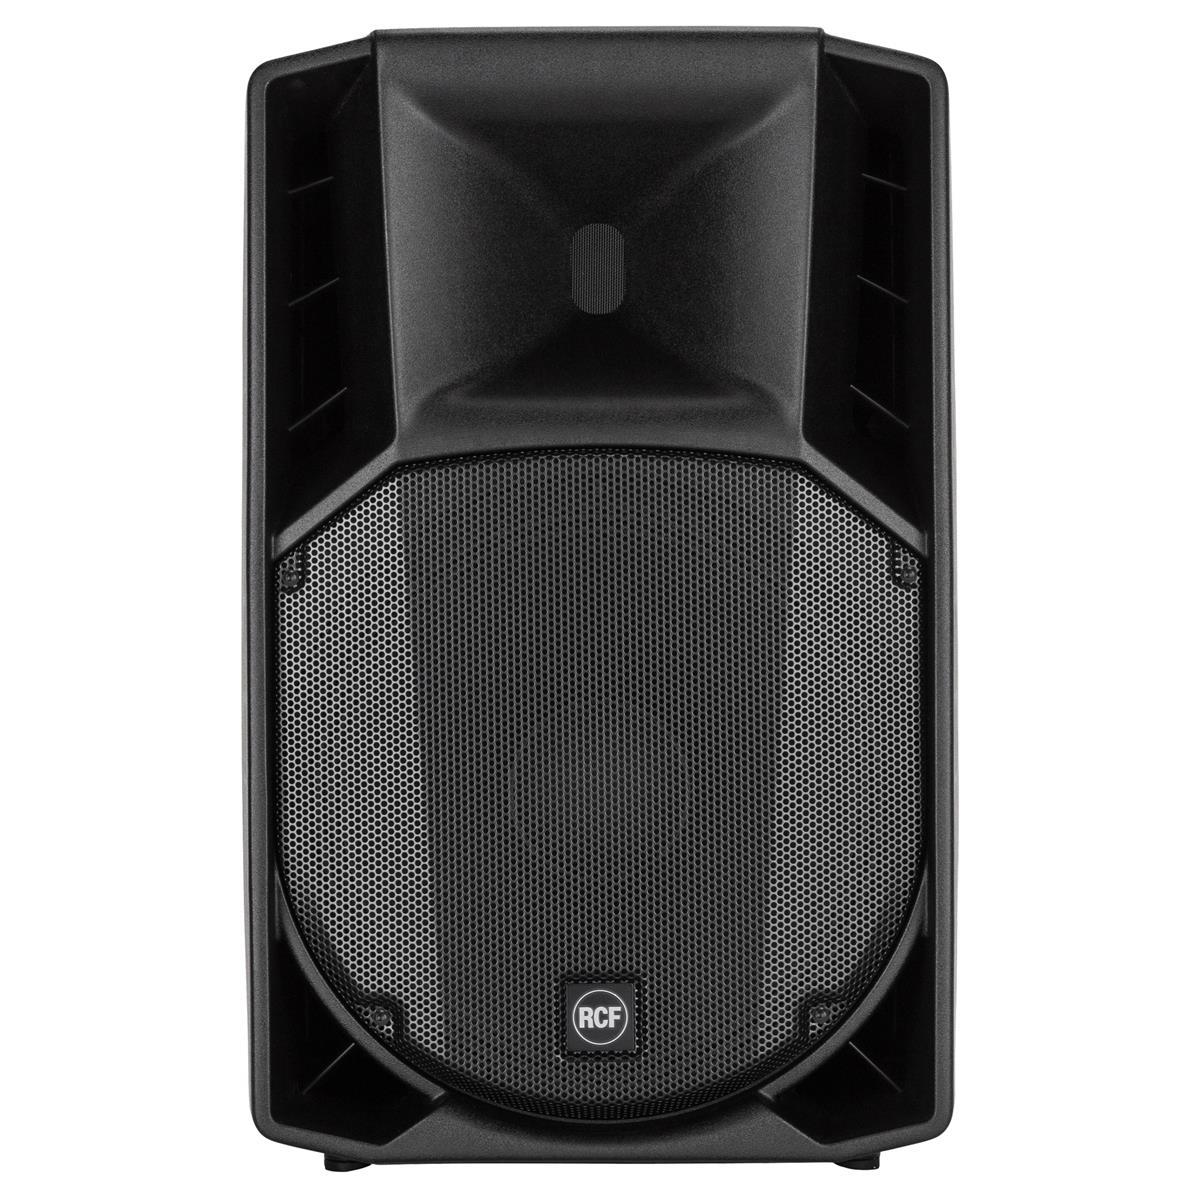 RCF ART 715-A MK4 Digital active speaker system 15in + 1in,